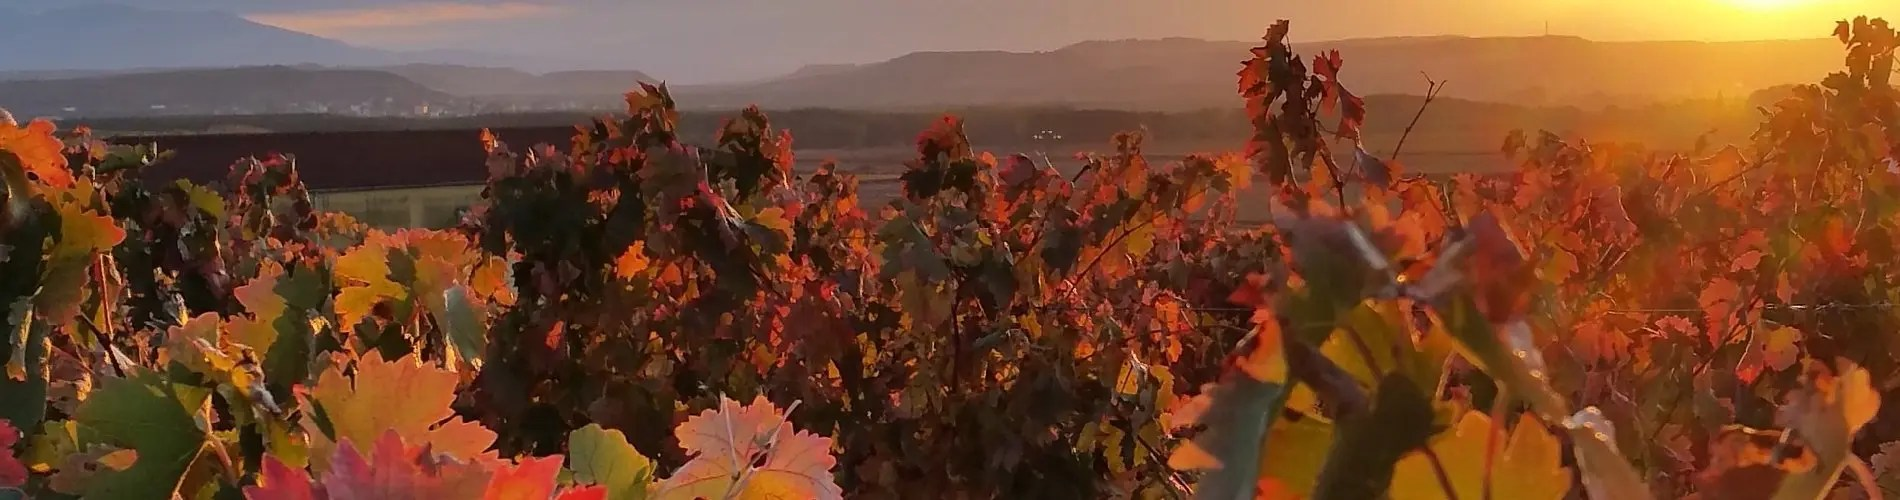 Spanish vines